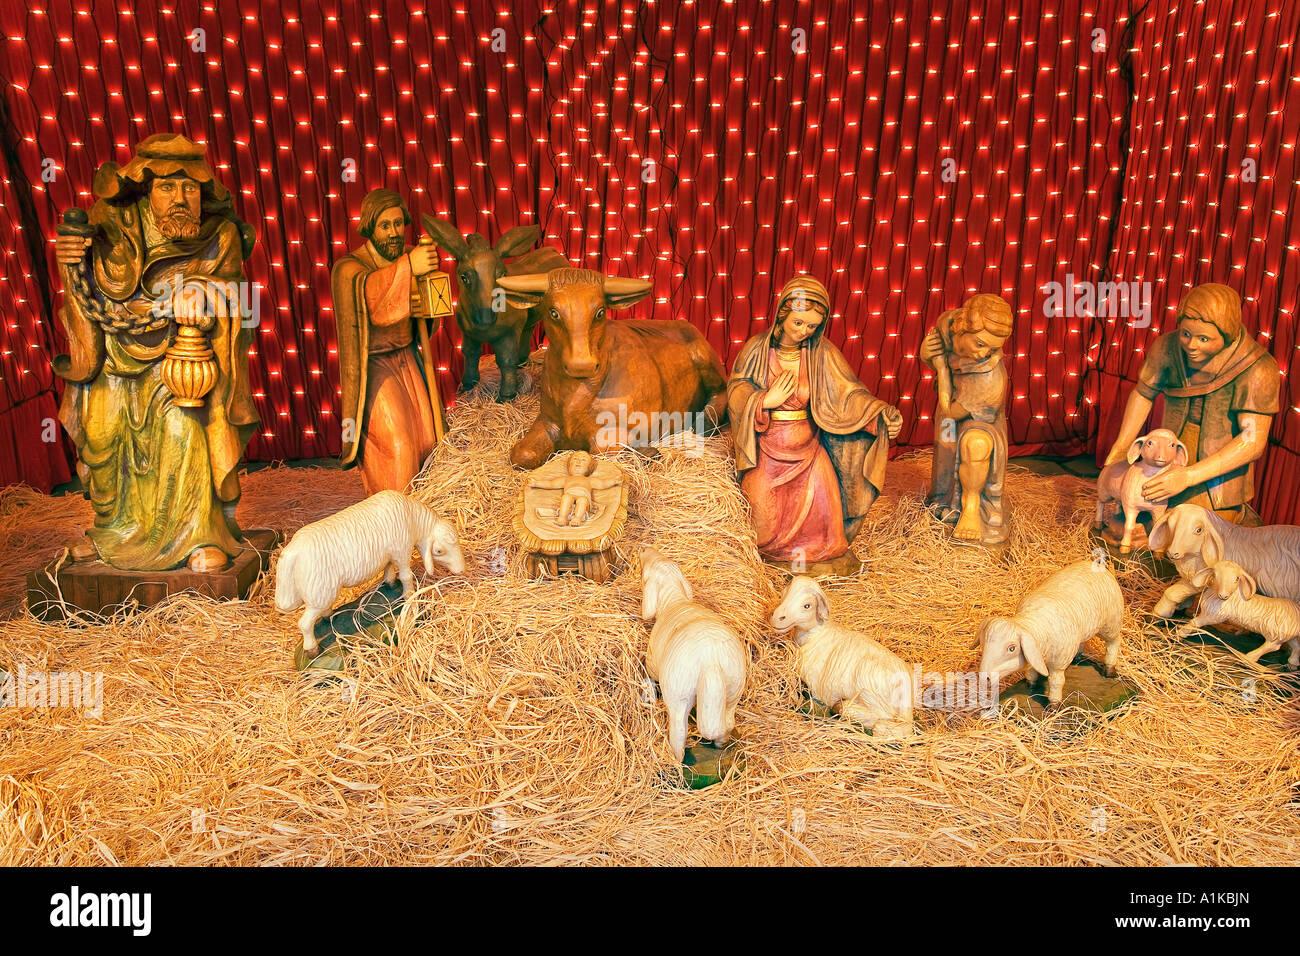 Carved nativity scene, Europa-Park Rust, Baden-Wuerttemberg, Germany - Stock Image